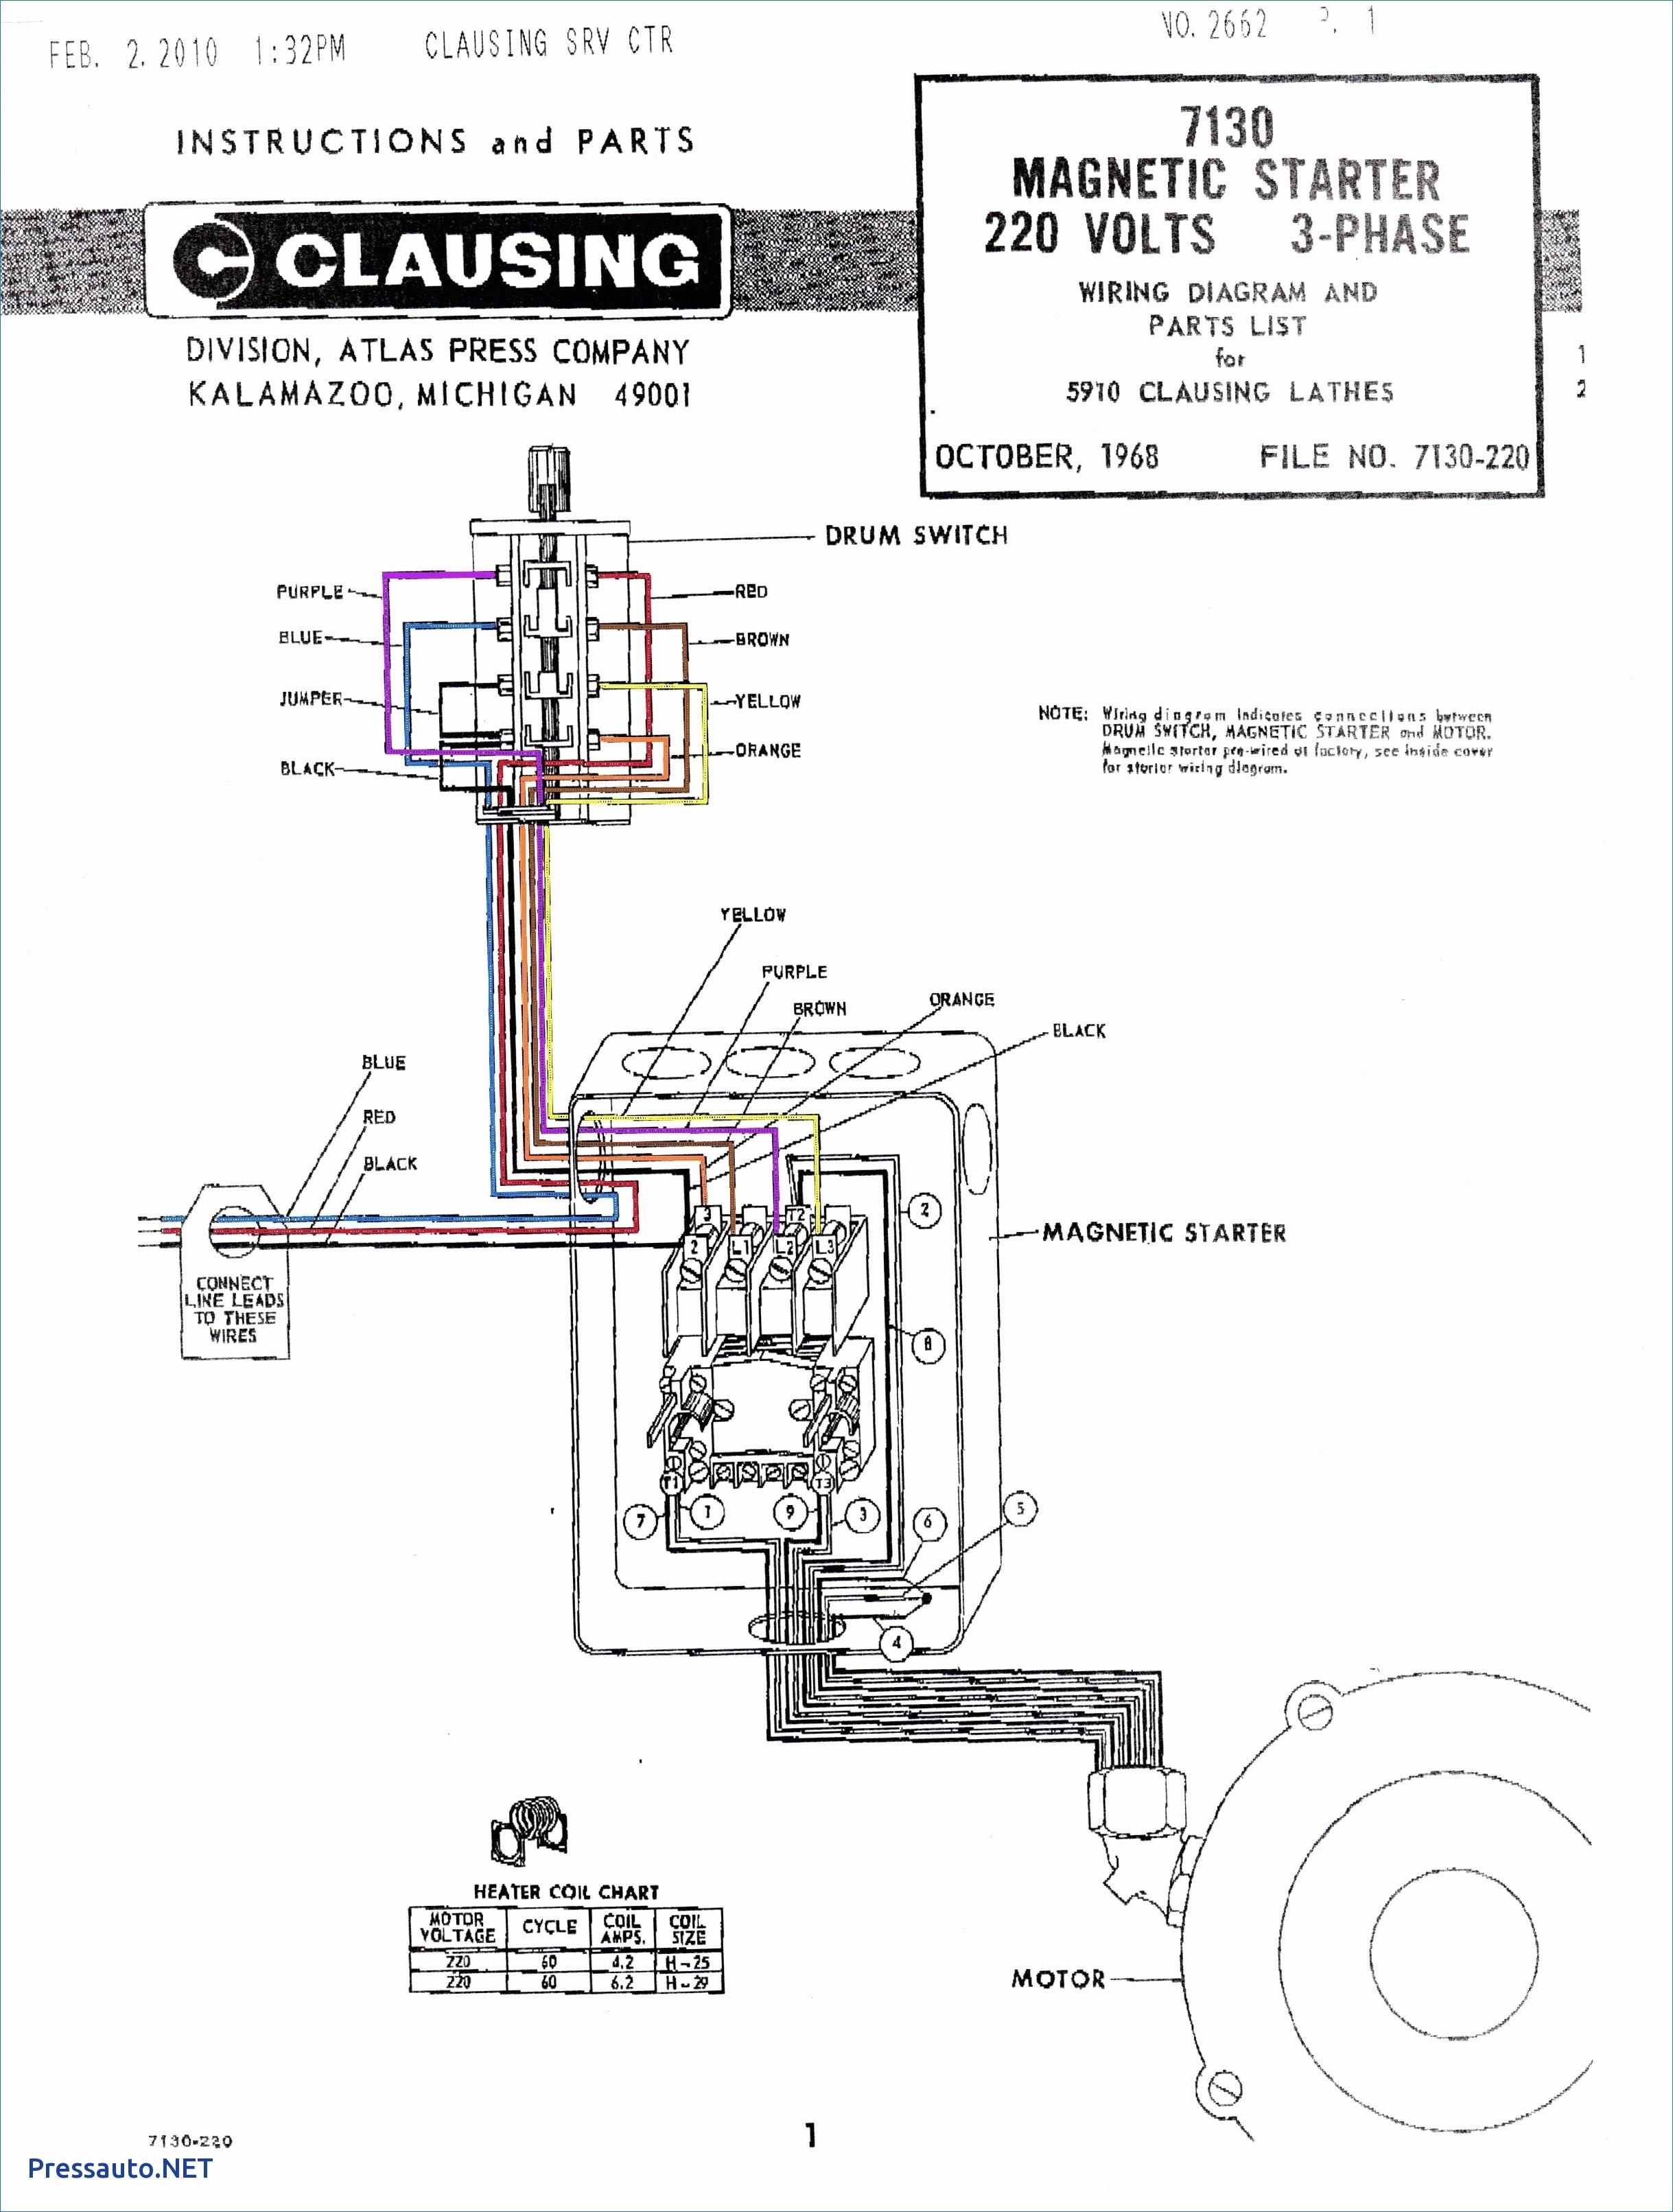 Trombetta Solenoid 12V Wiring Diagram | Wiring Library - Trombetta Solenoid Wiring Diagram